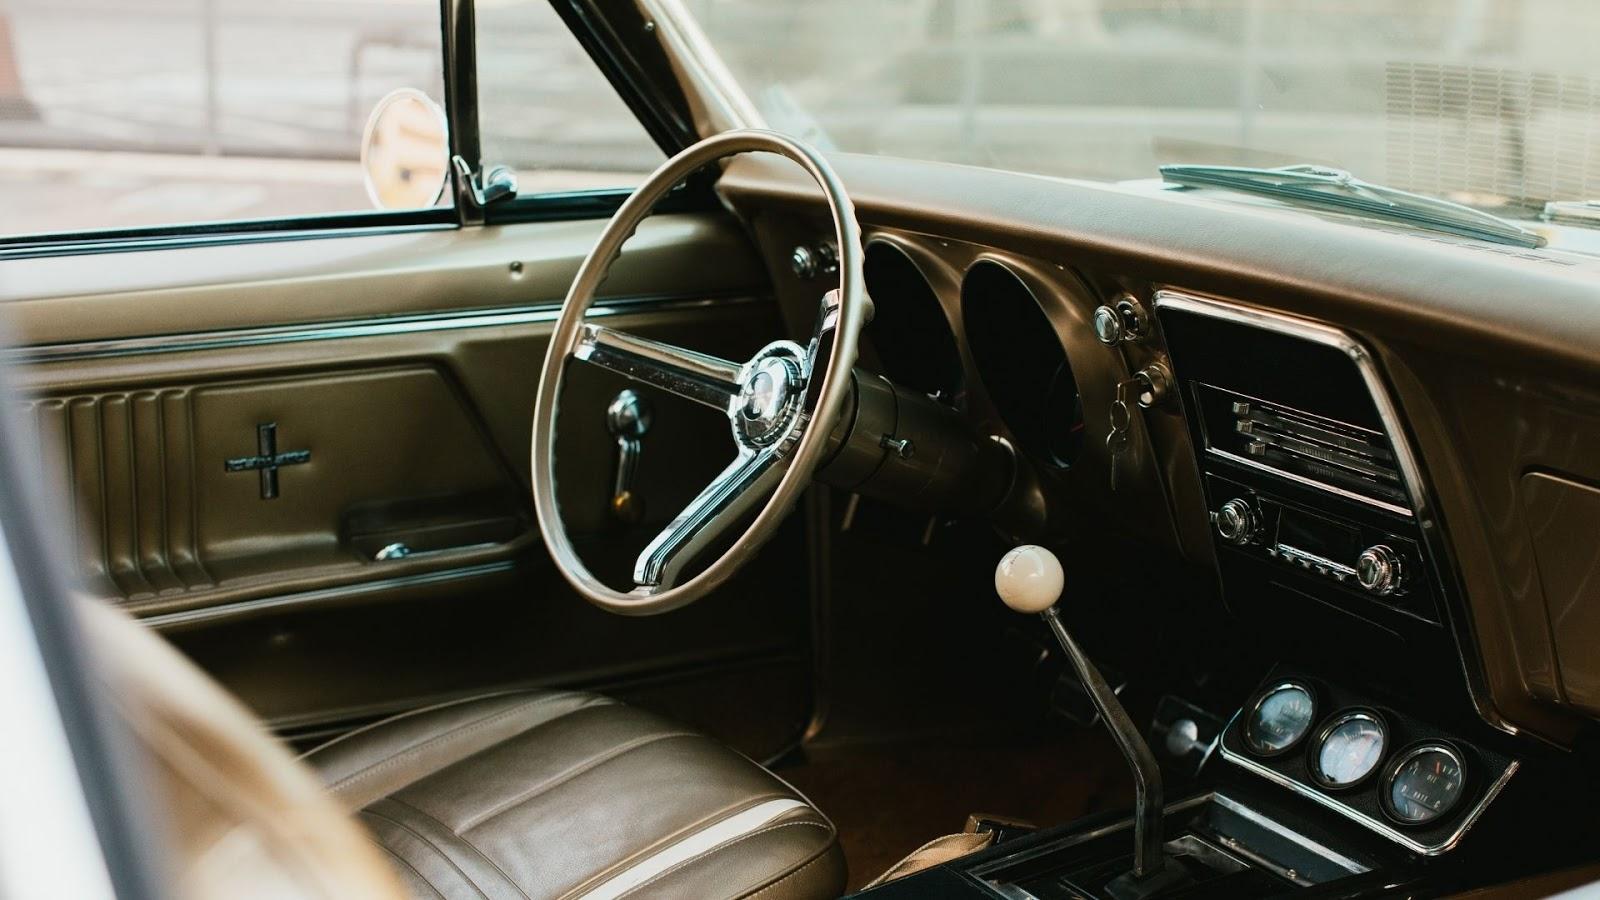 1967 black panthers Vintage Car